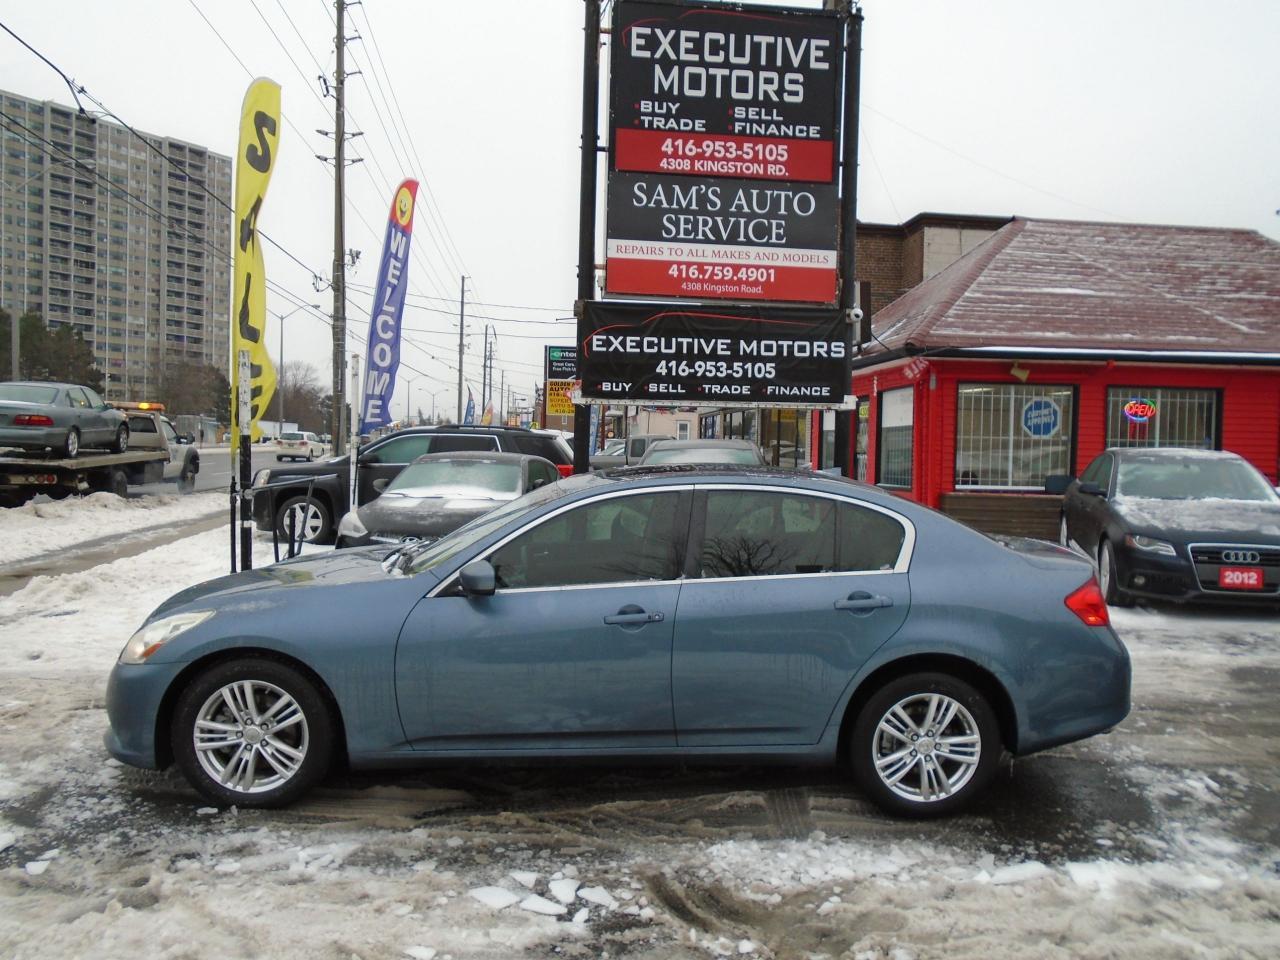 2010 Infiniti G37 Luxury / AWD / LIKE NEW MINT CONDITION / CERTIFIED